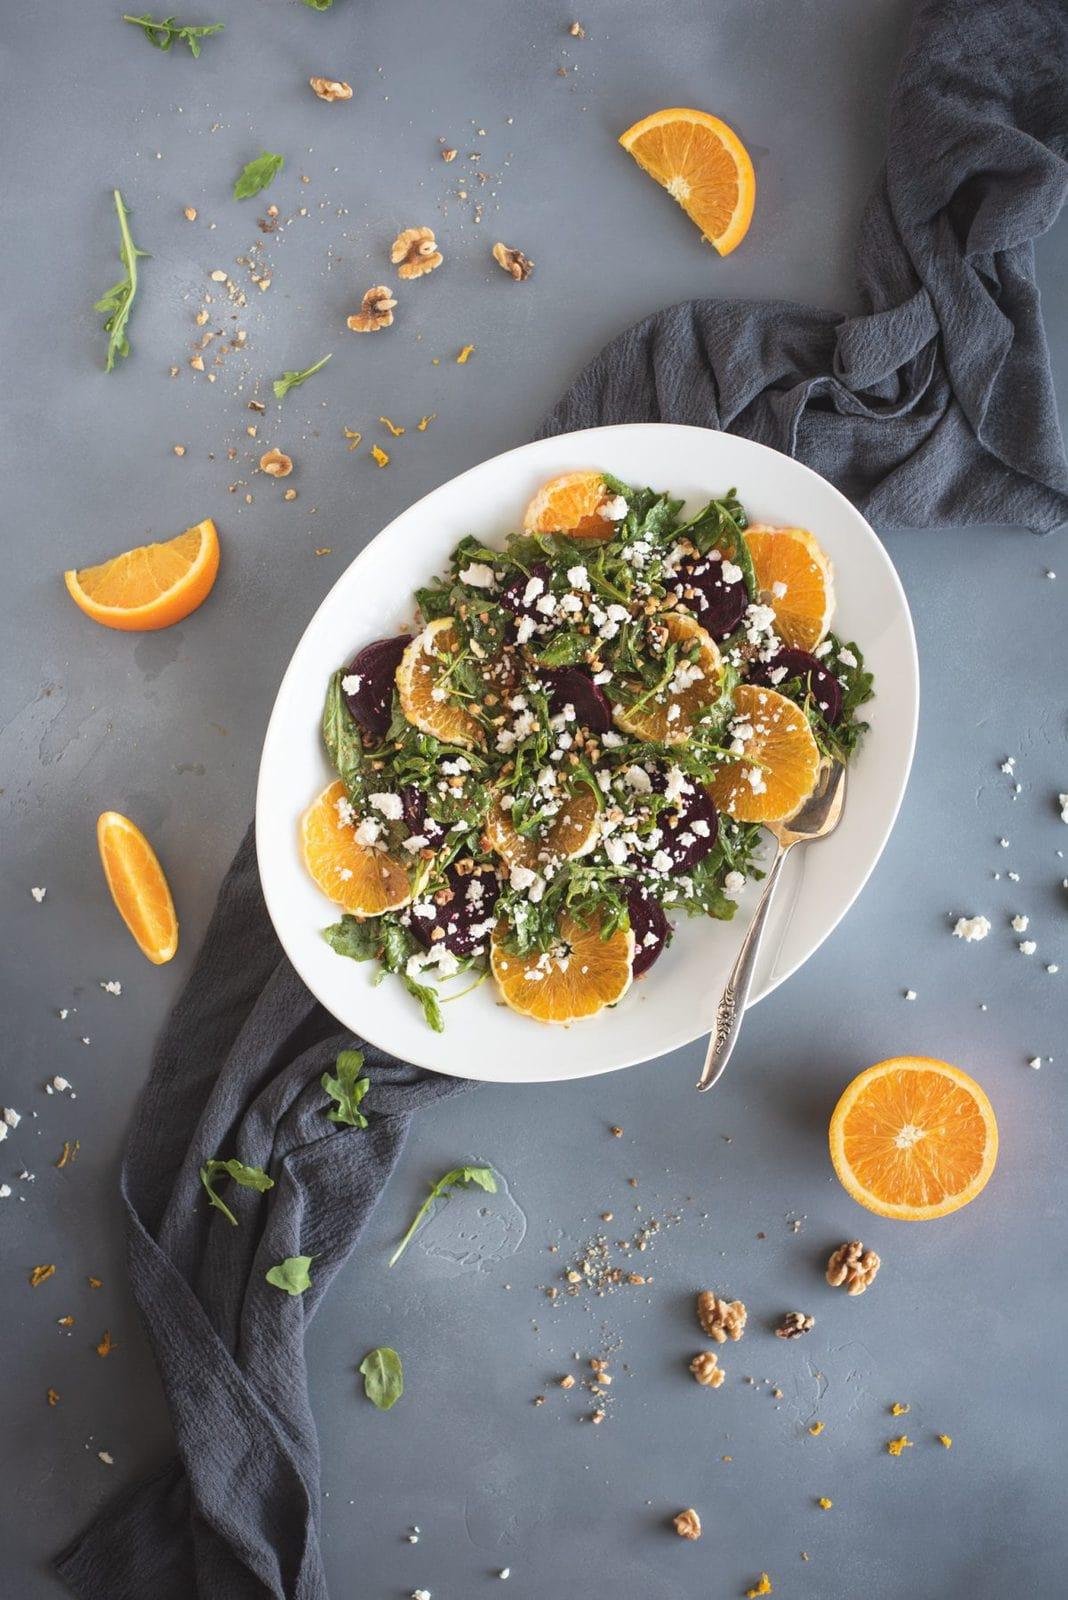 Photo of arugula salad with roasted beets and orange slices